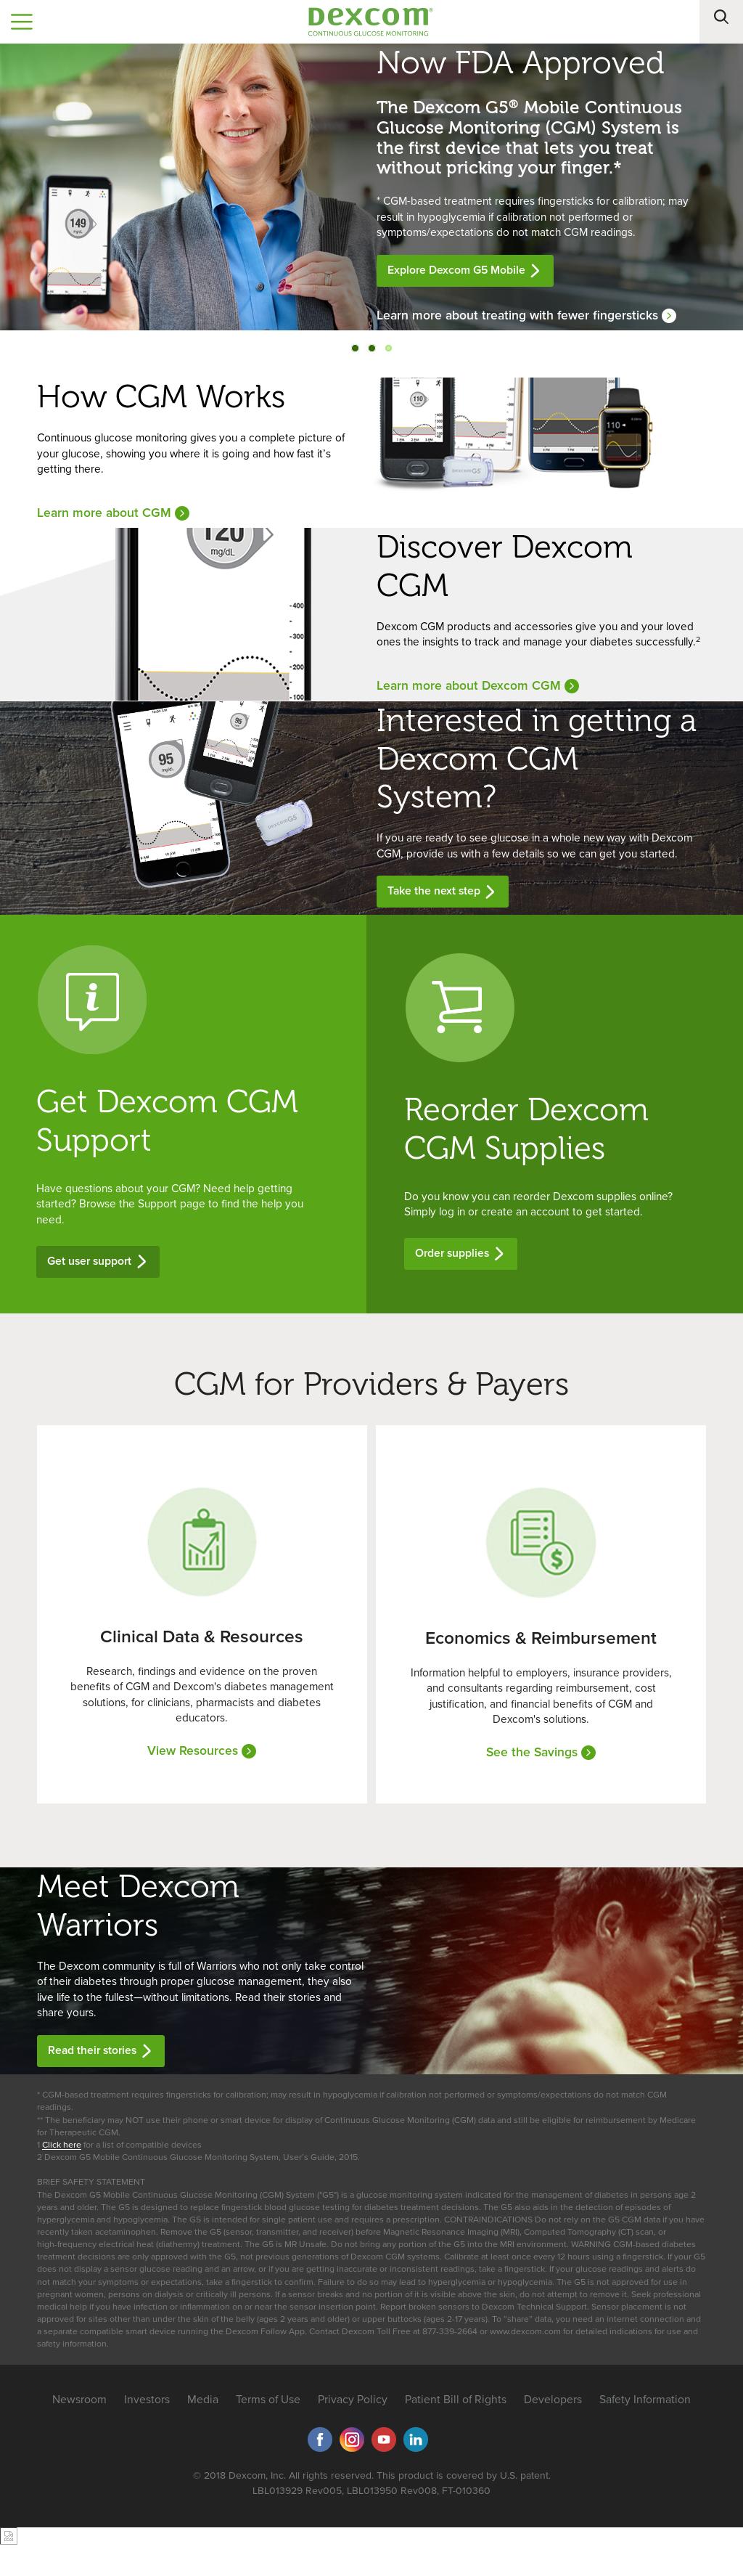 Dexcom Competitors, Revenue and Employees - Owler Company